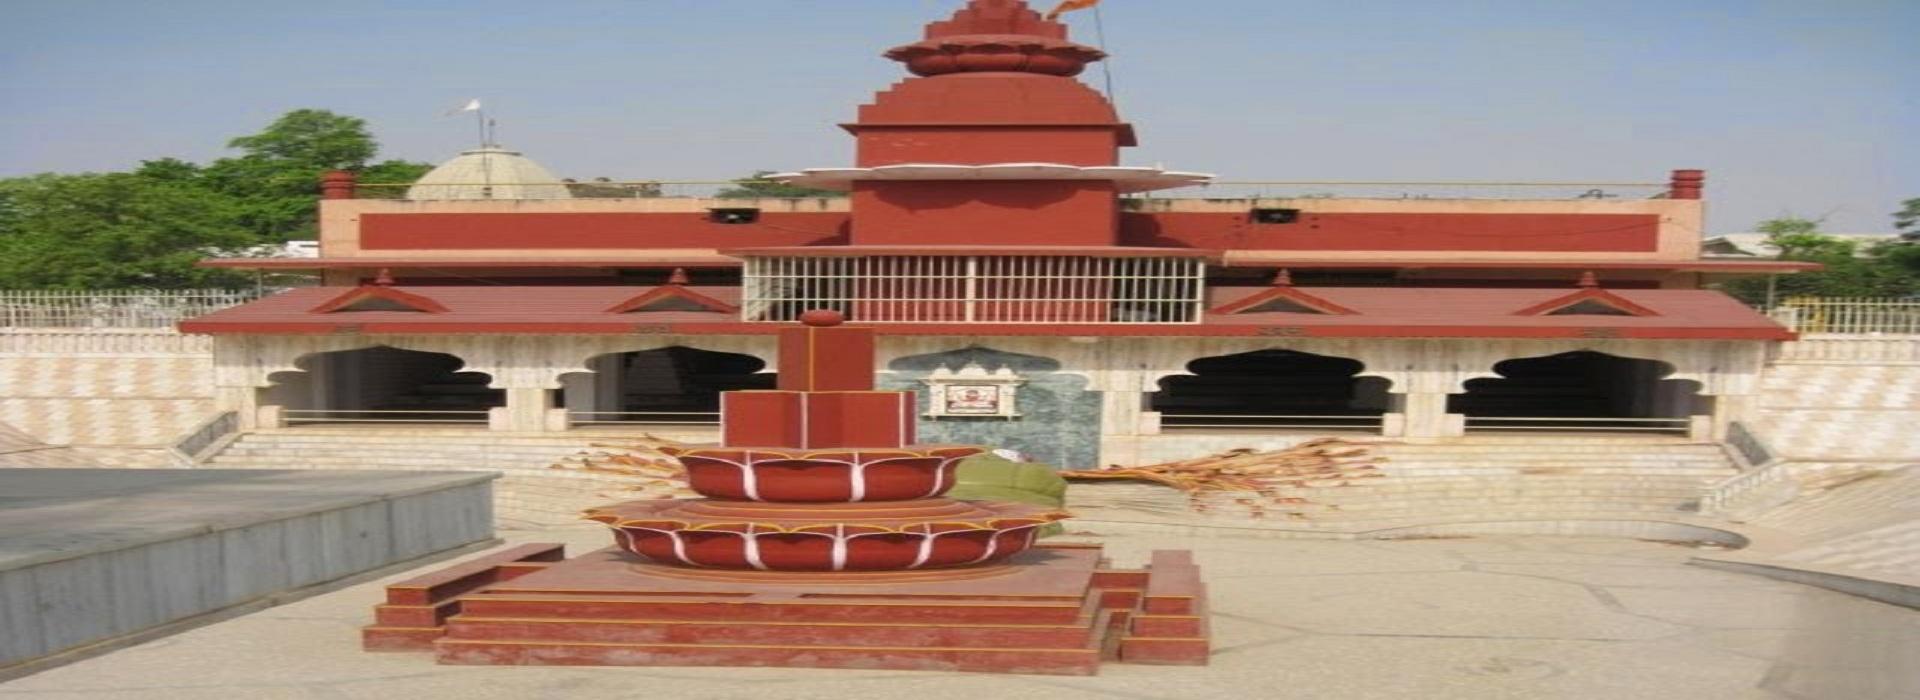 Pitambara Mandir Datia full information